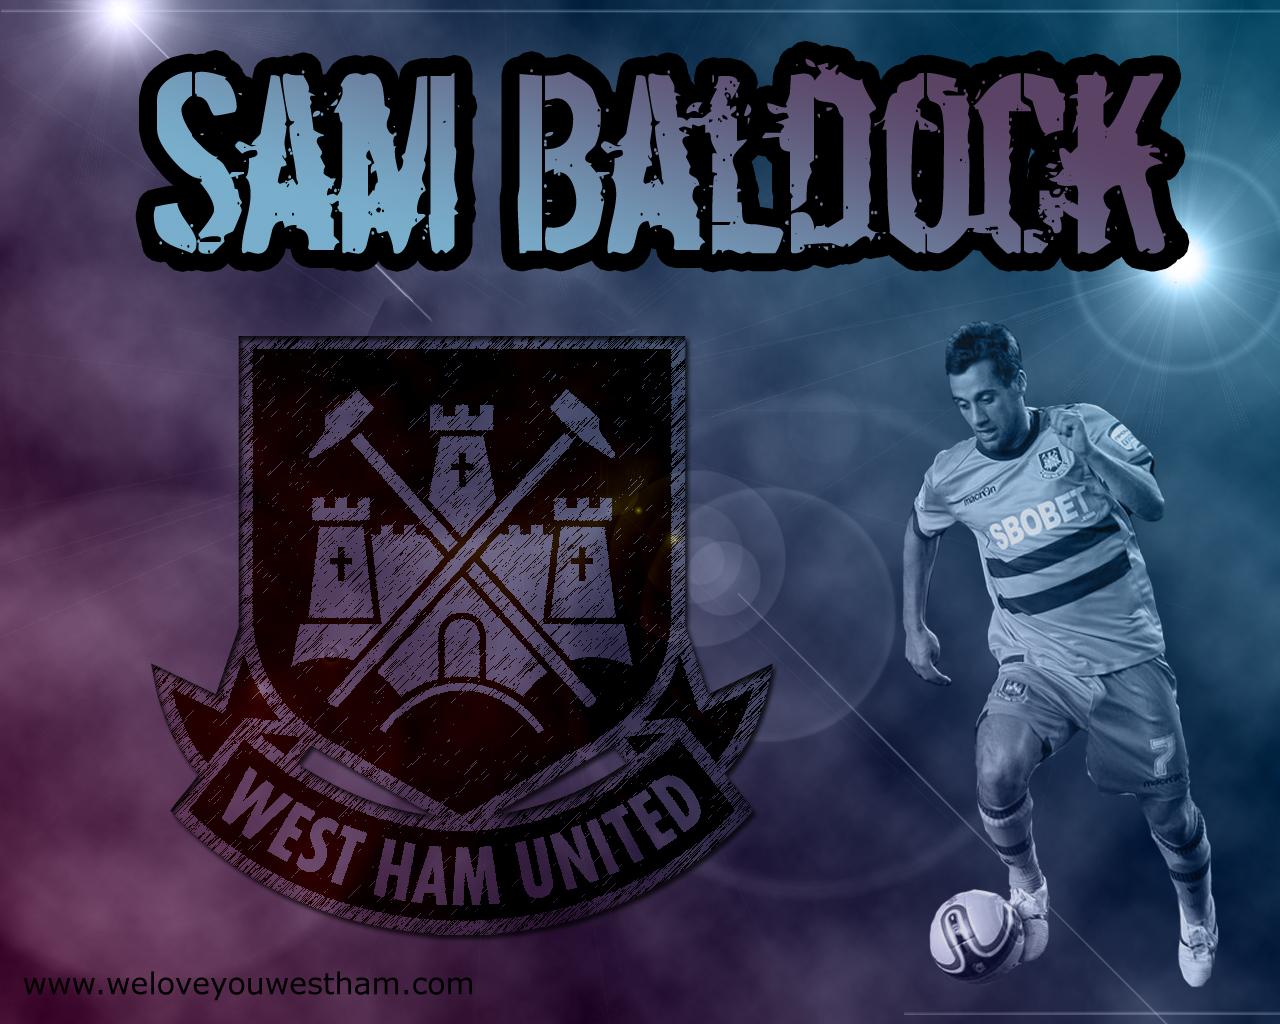 http://2.bp.blogspot.com/-BJ1JKkXdfKs/Tt9VZRkc06I/AAAAAAAAAWw/Un-L9aOD5Vk/s1600/Sam+Baldock+Wallpaper+2.jpg